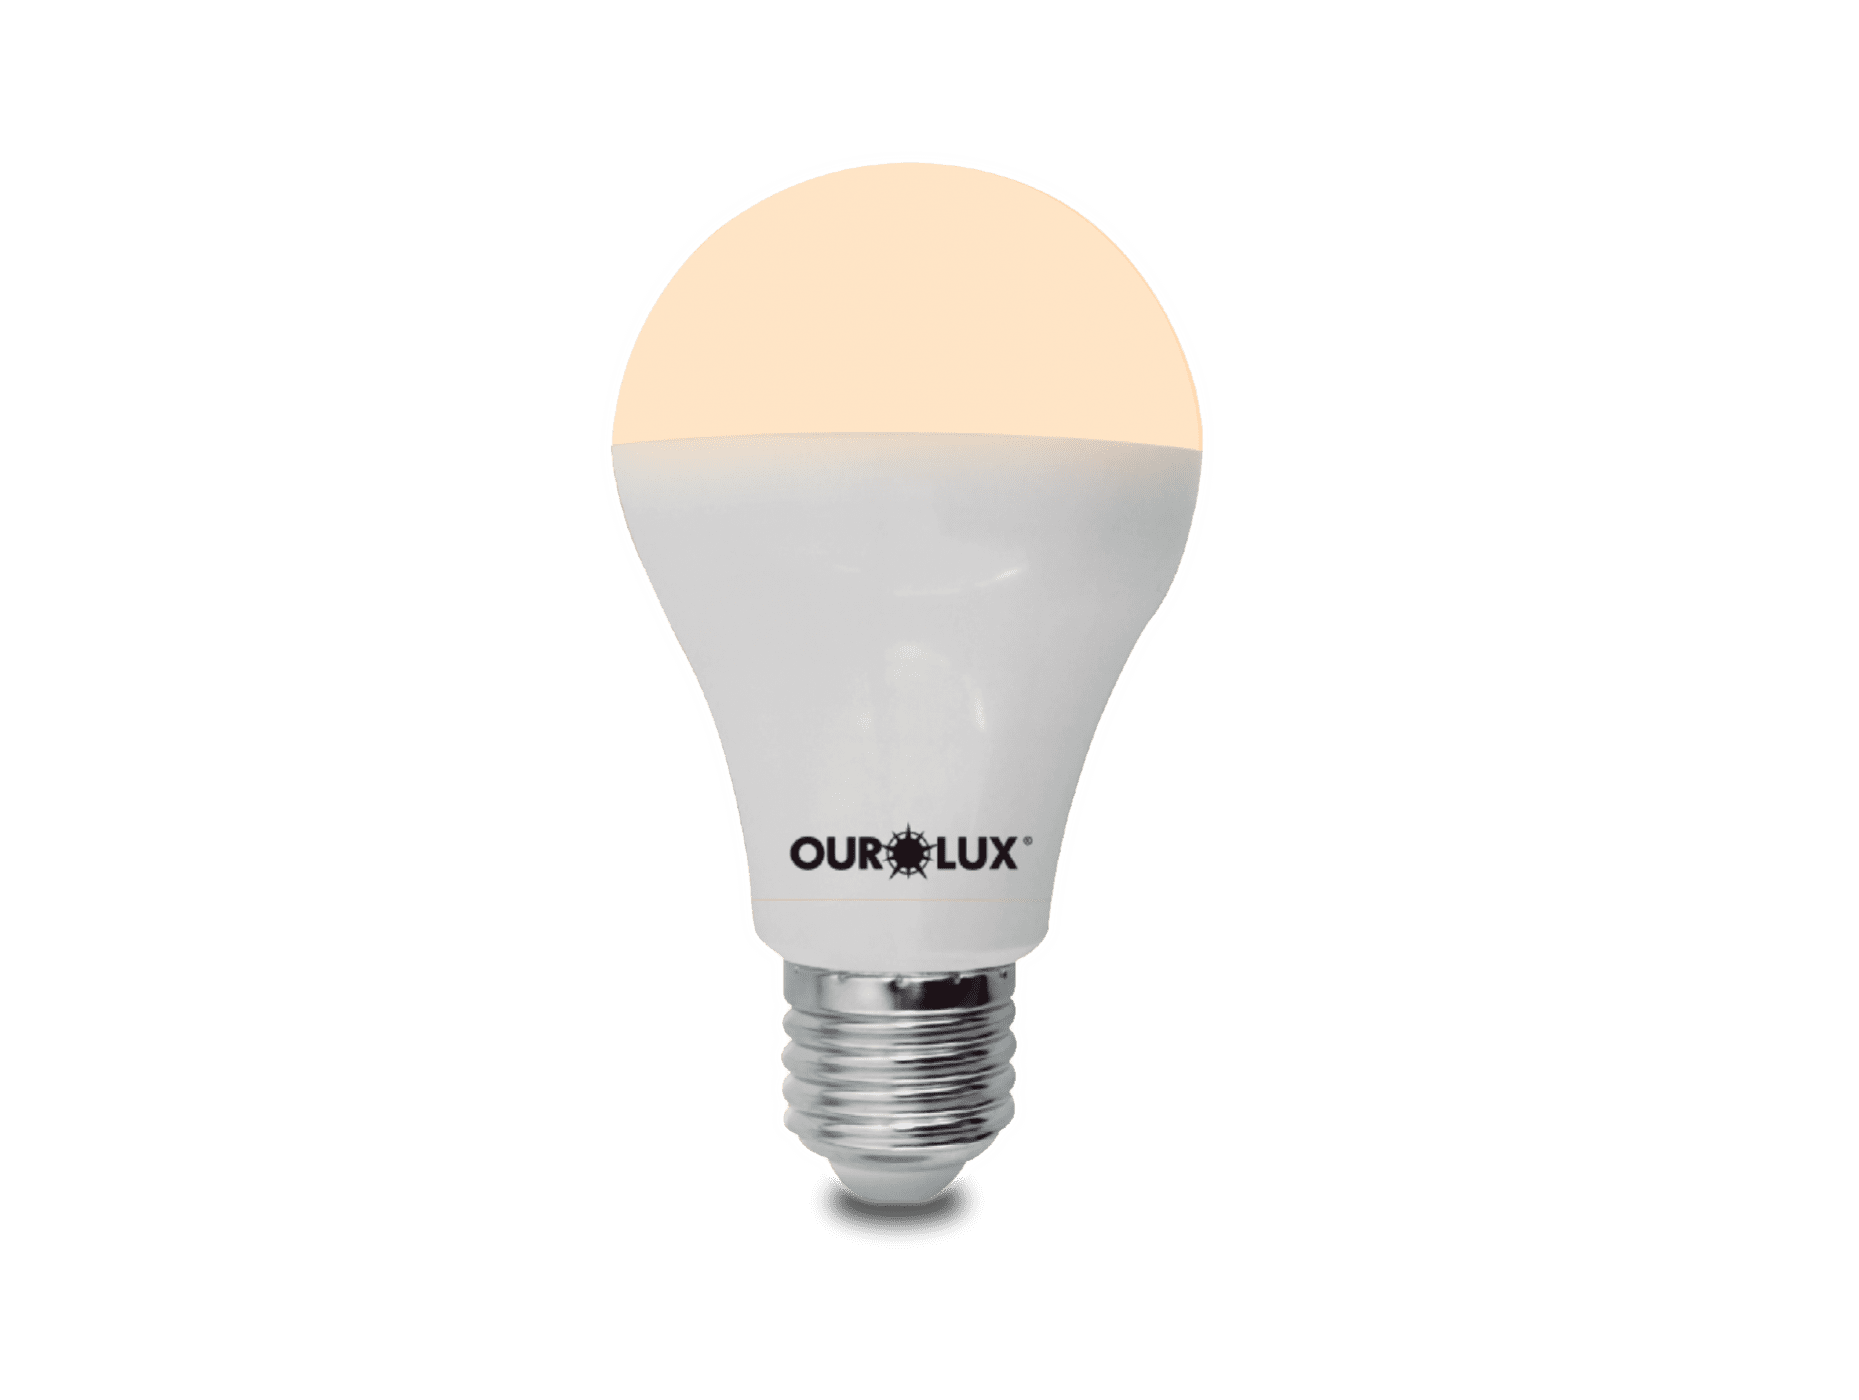 Lâmpada Ourolux Superled 6W Bivolt Branca  - Casa Mattos